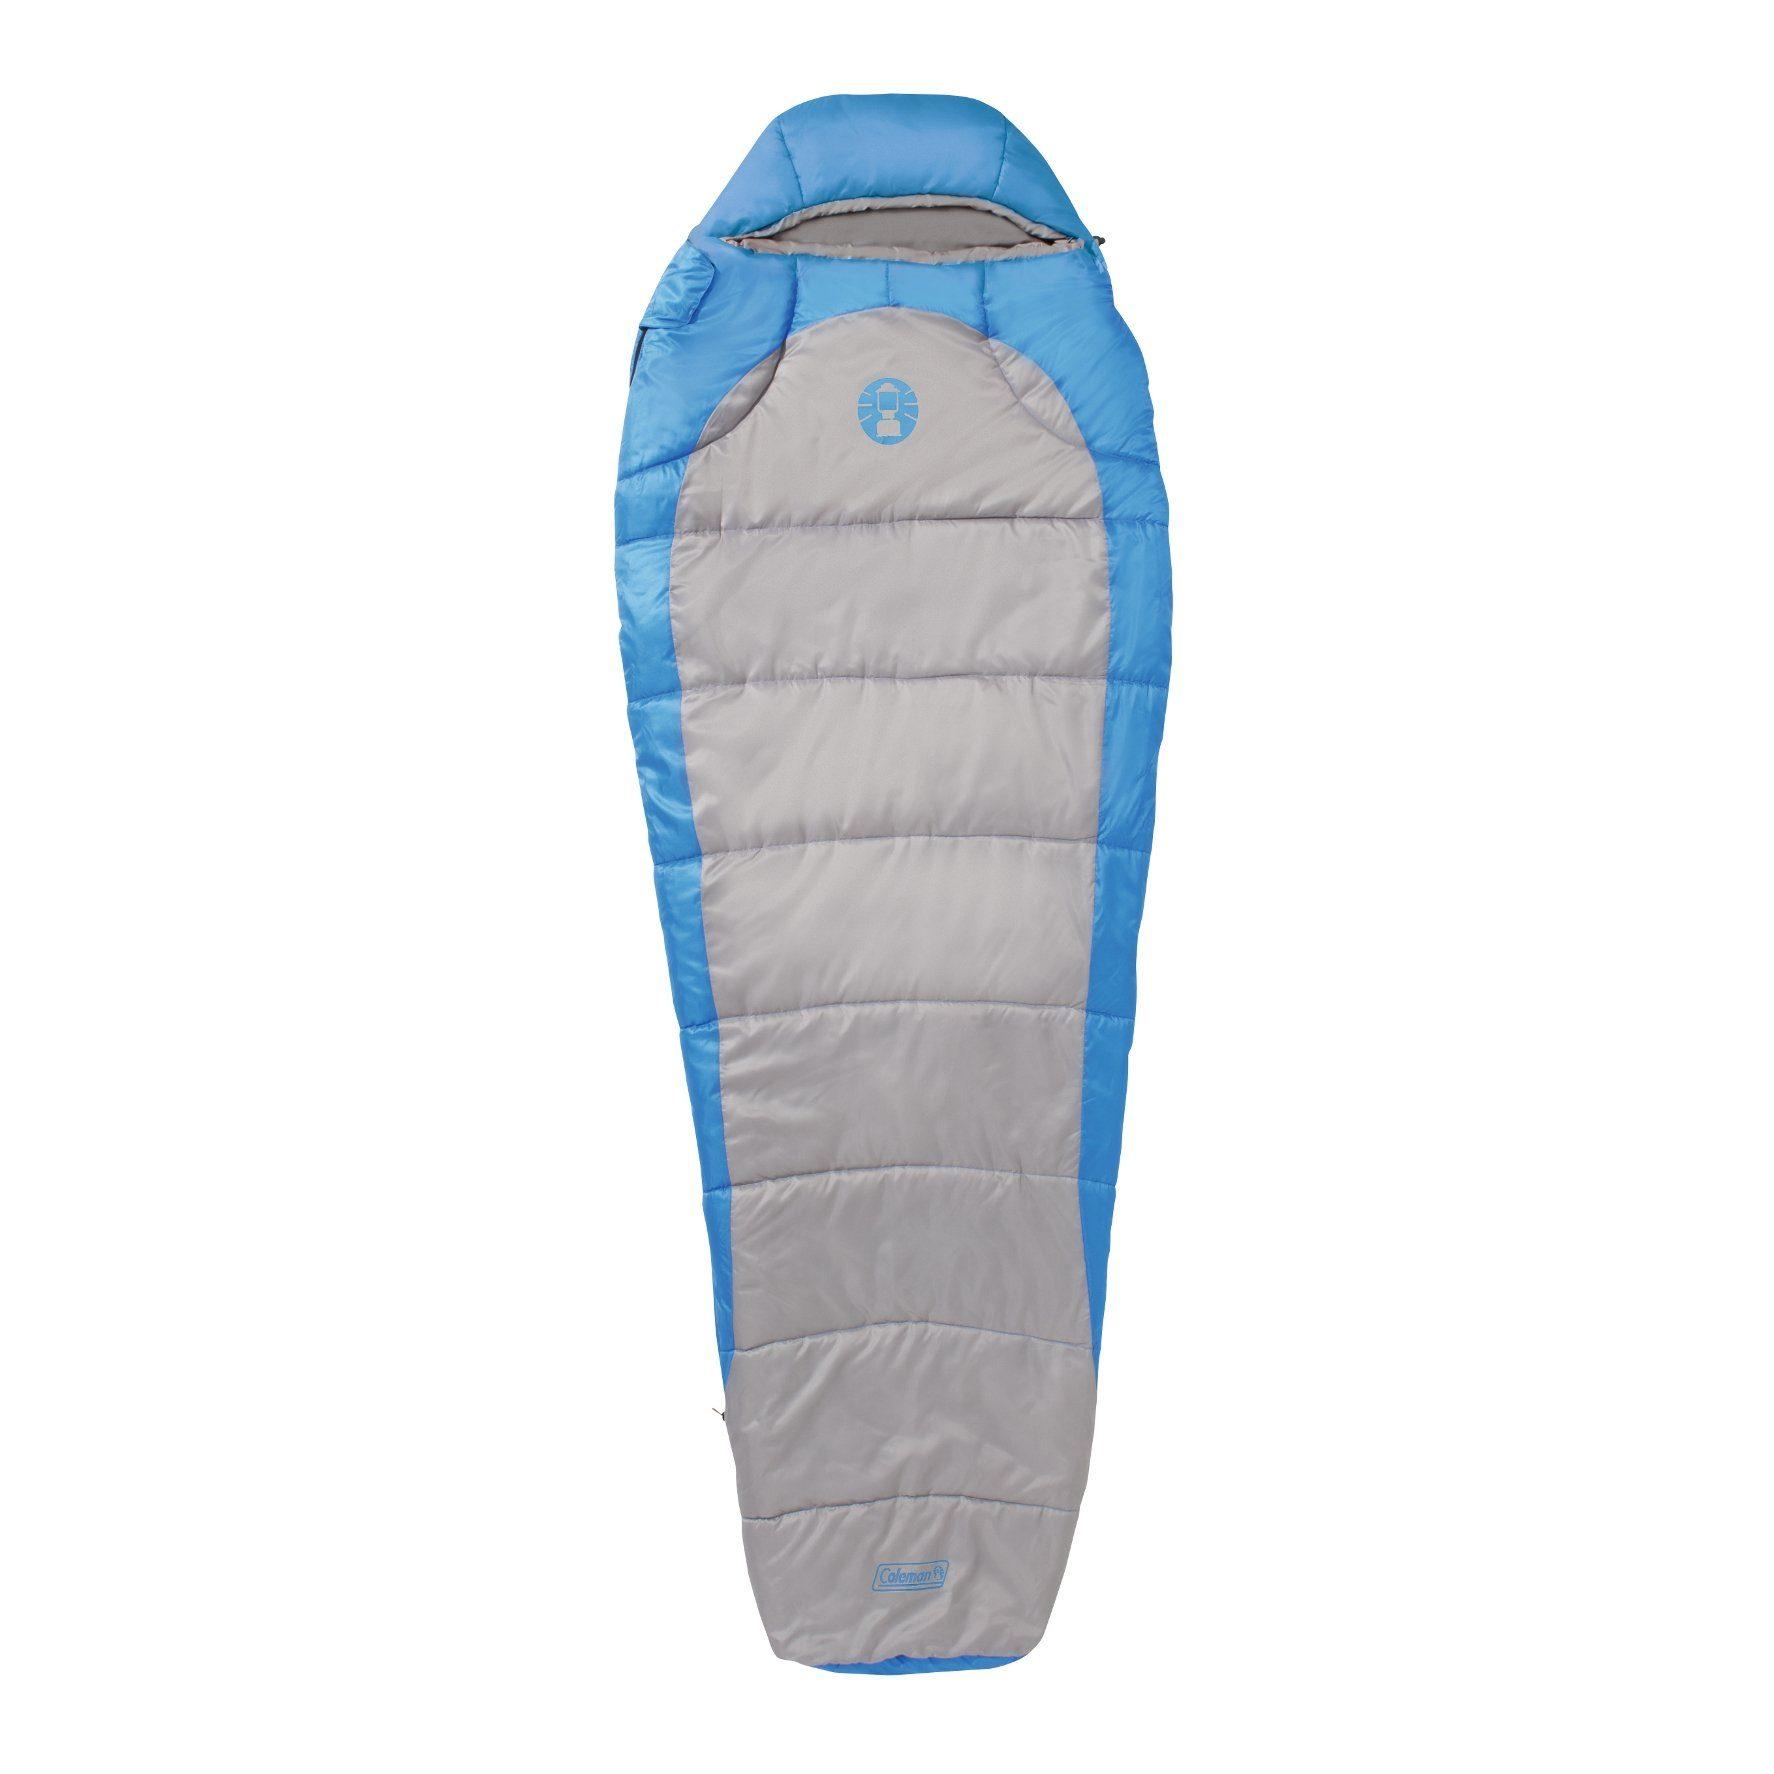 COLEMAN Schlafsack »Telluride 200 Sleeping Bag«